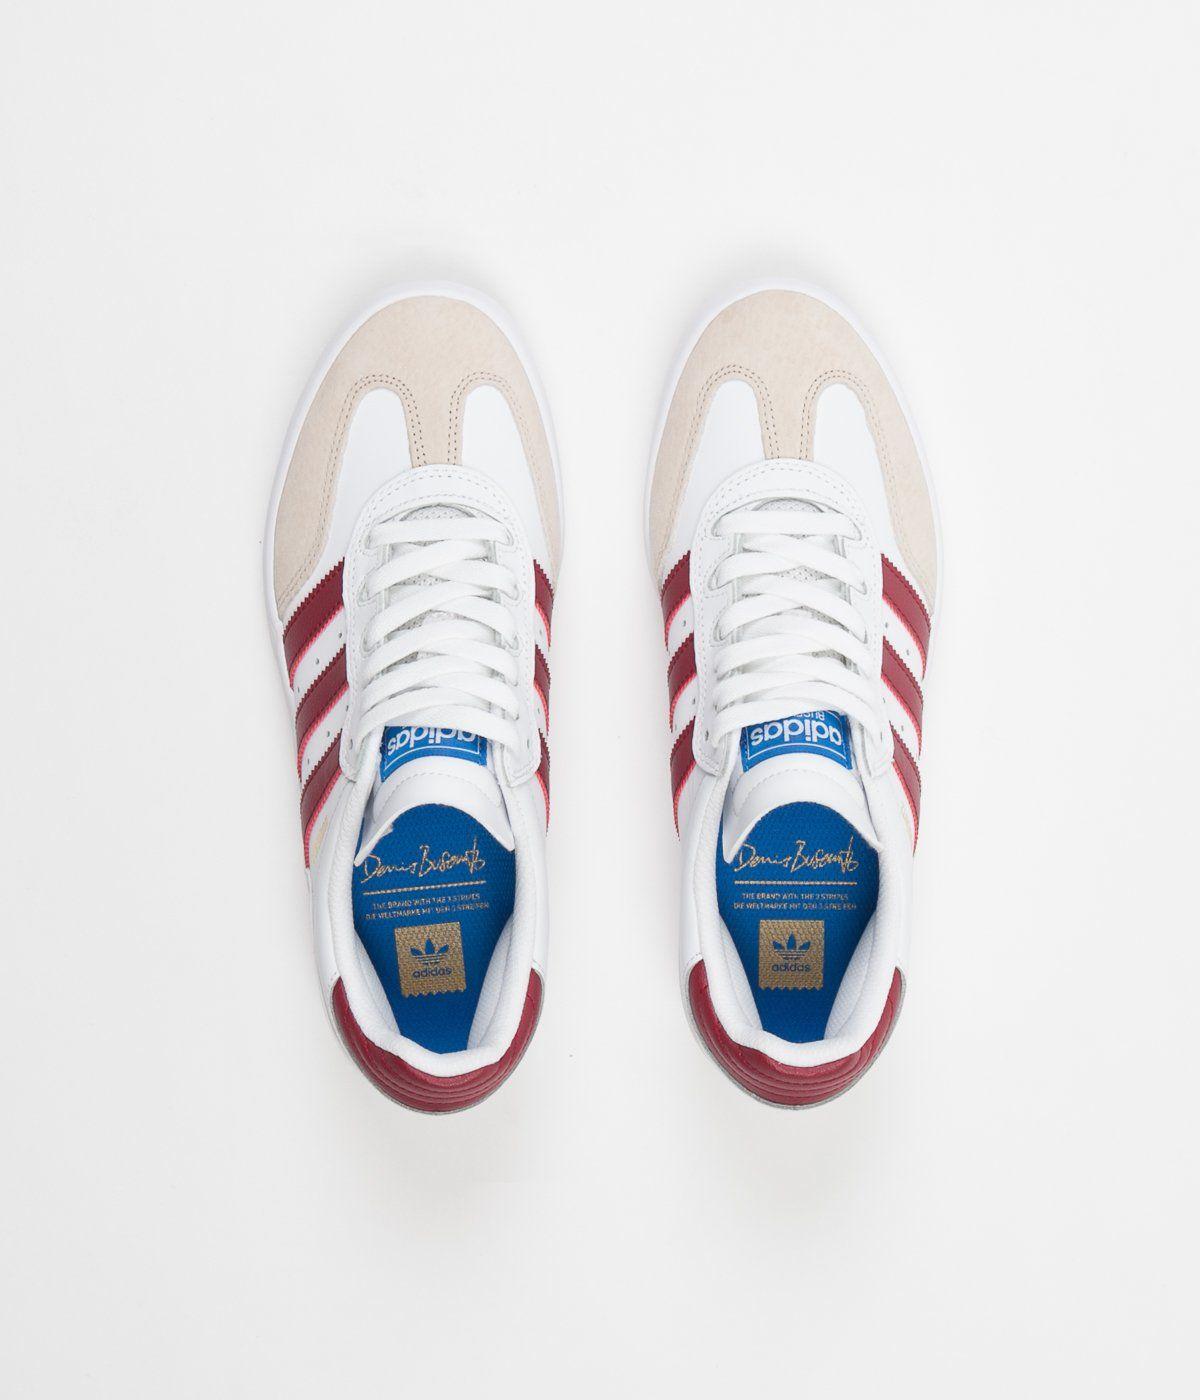 Busenitz Vulc Rx Burgundy Collegiate White Adidas Shoes 0wXPZN8nOk